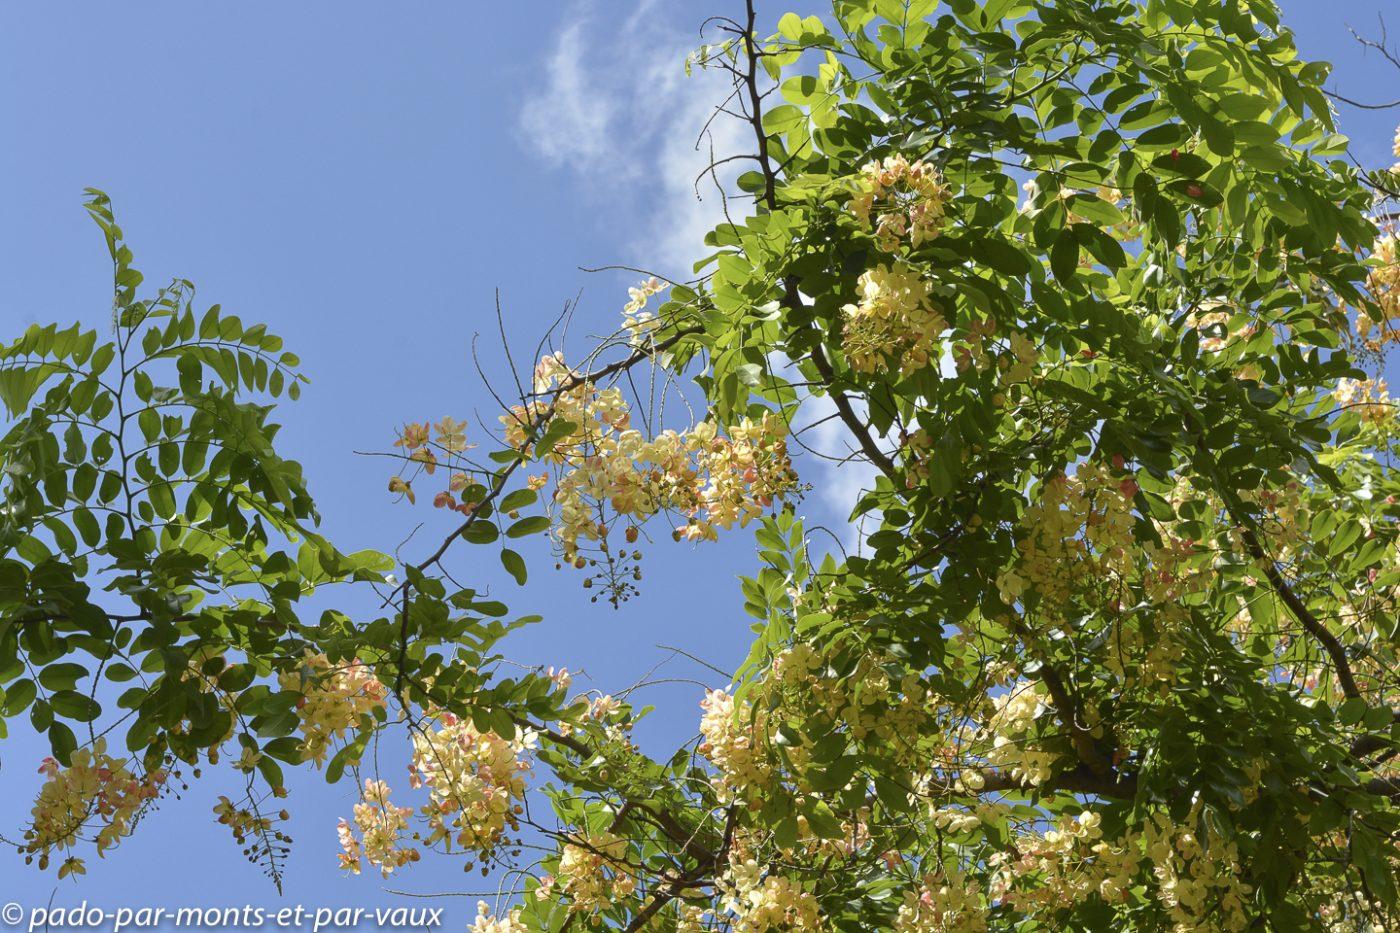 Cassia nealiae